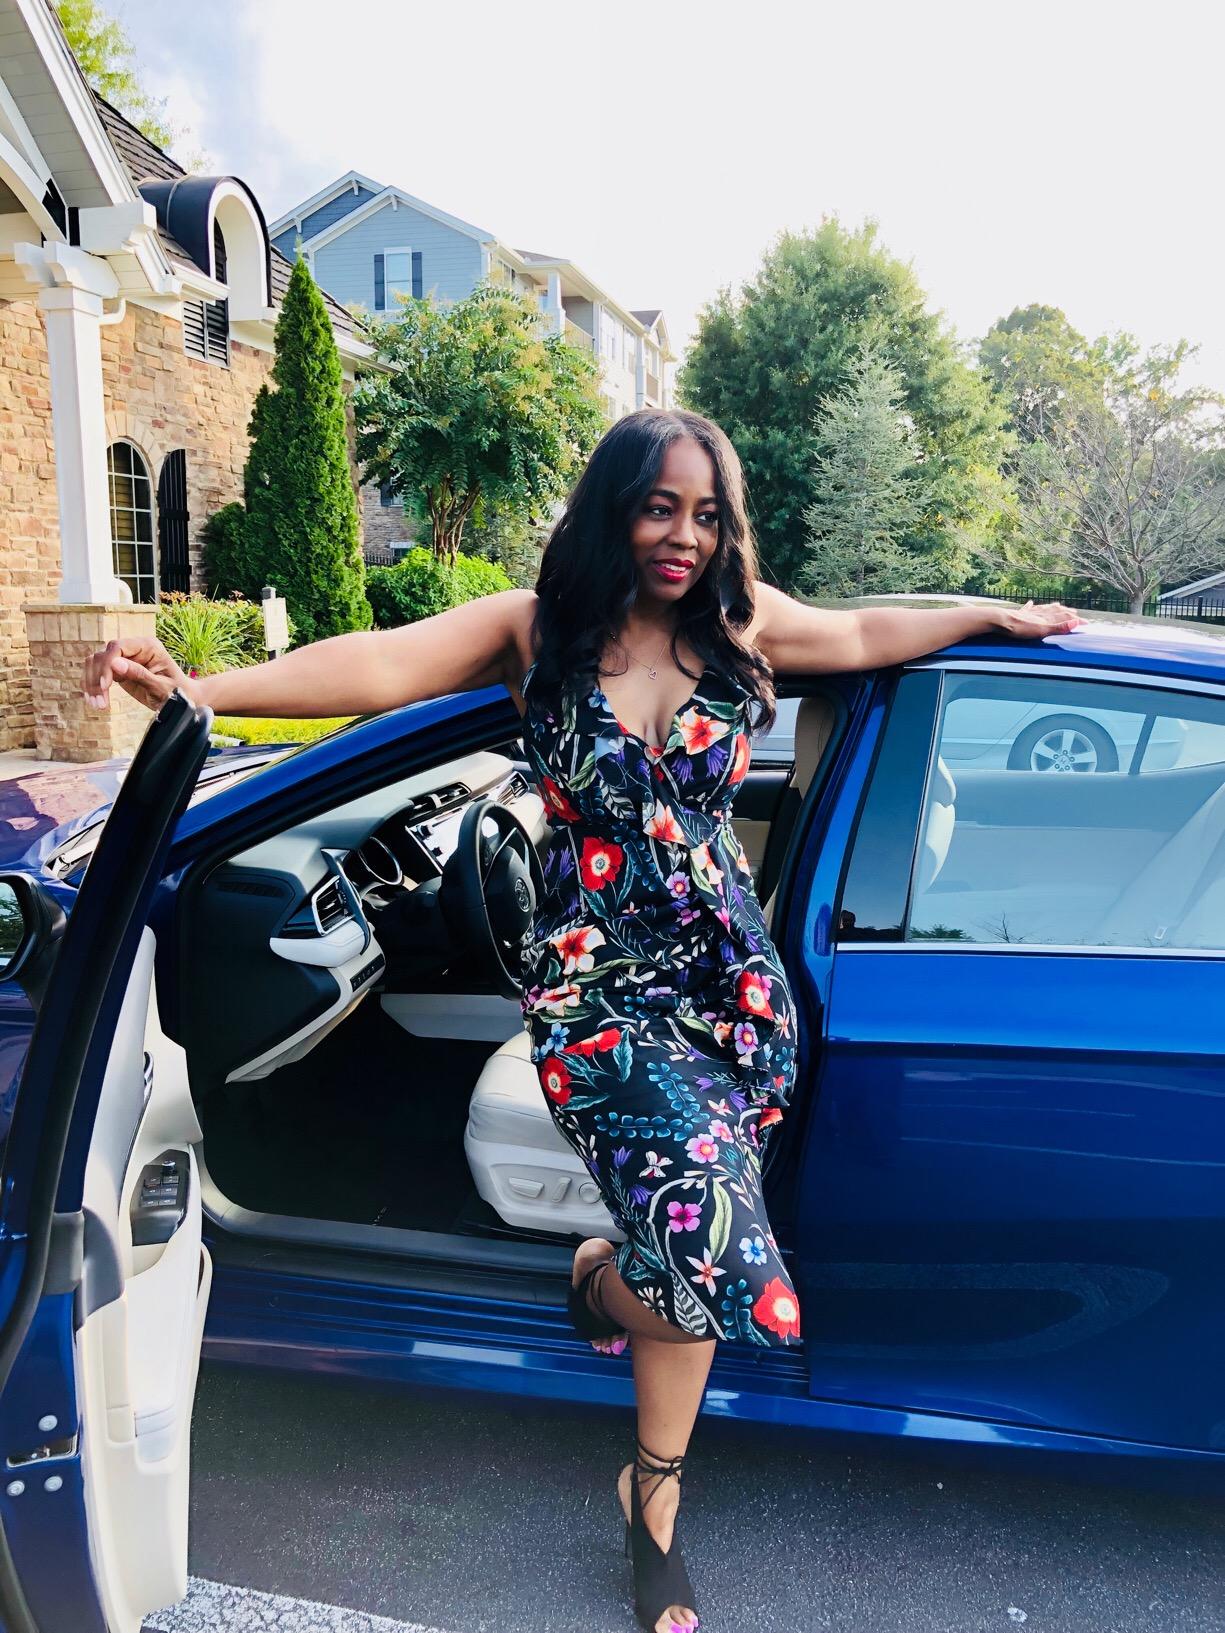 My Style: Gardenia Ruffle Dress